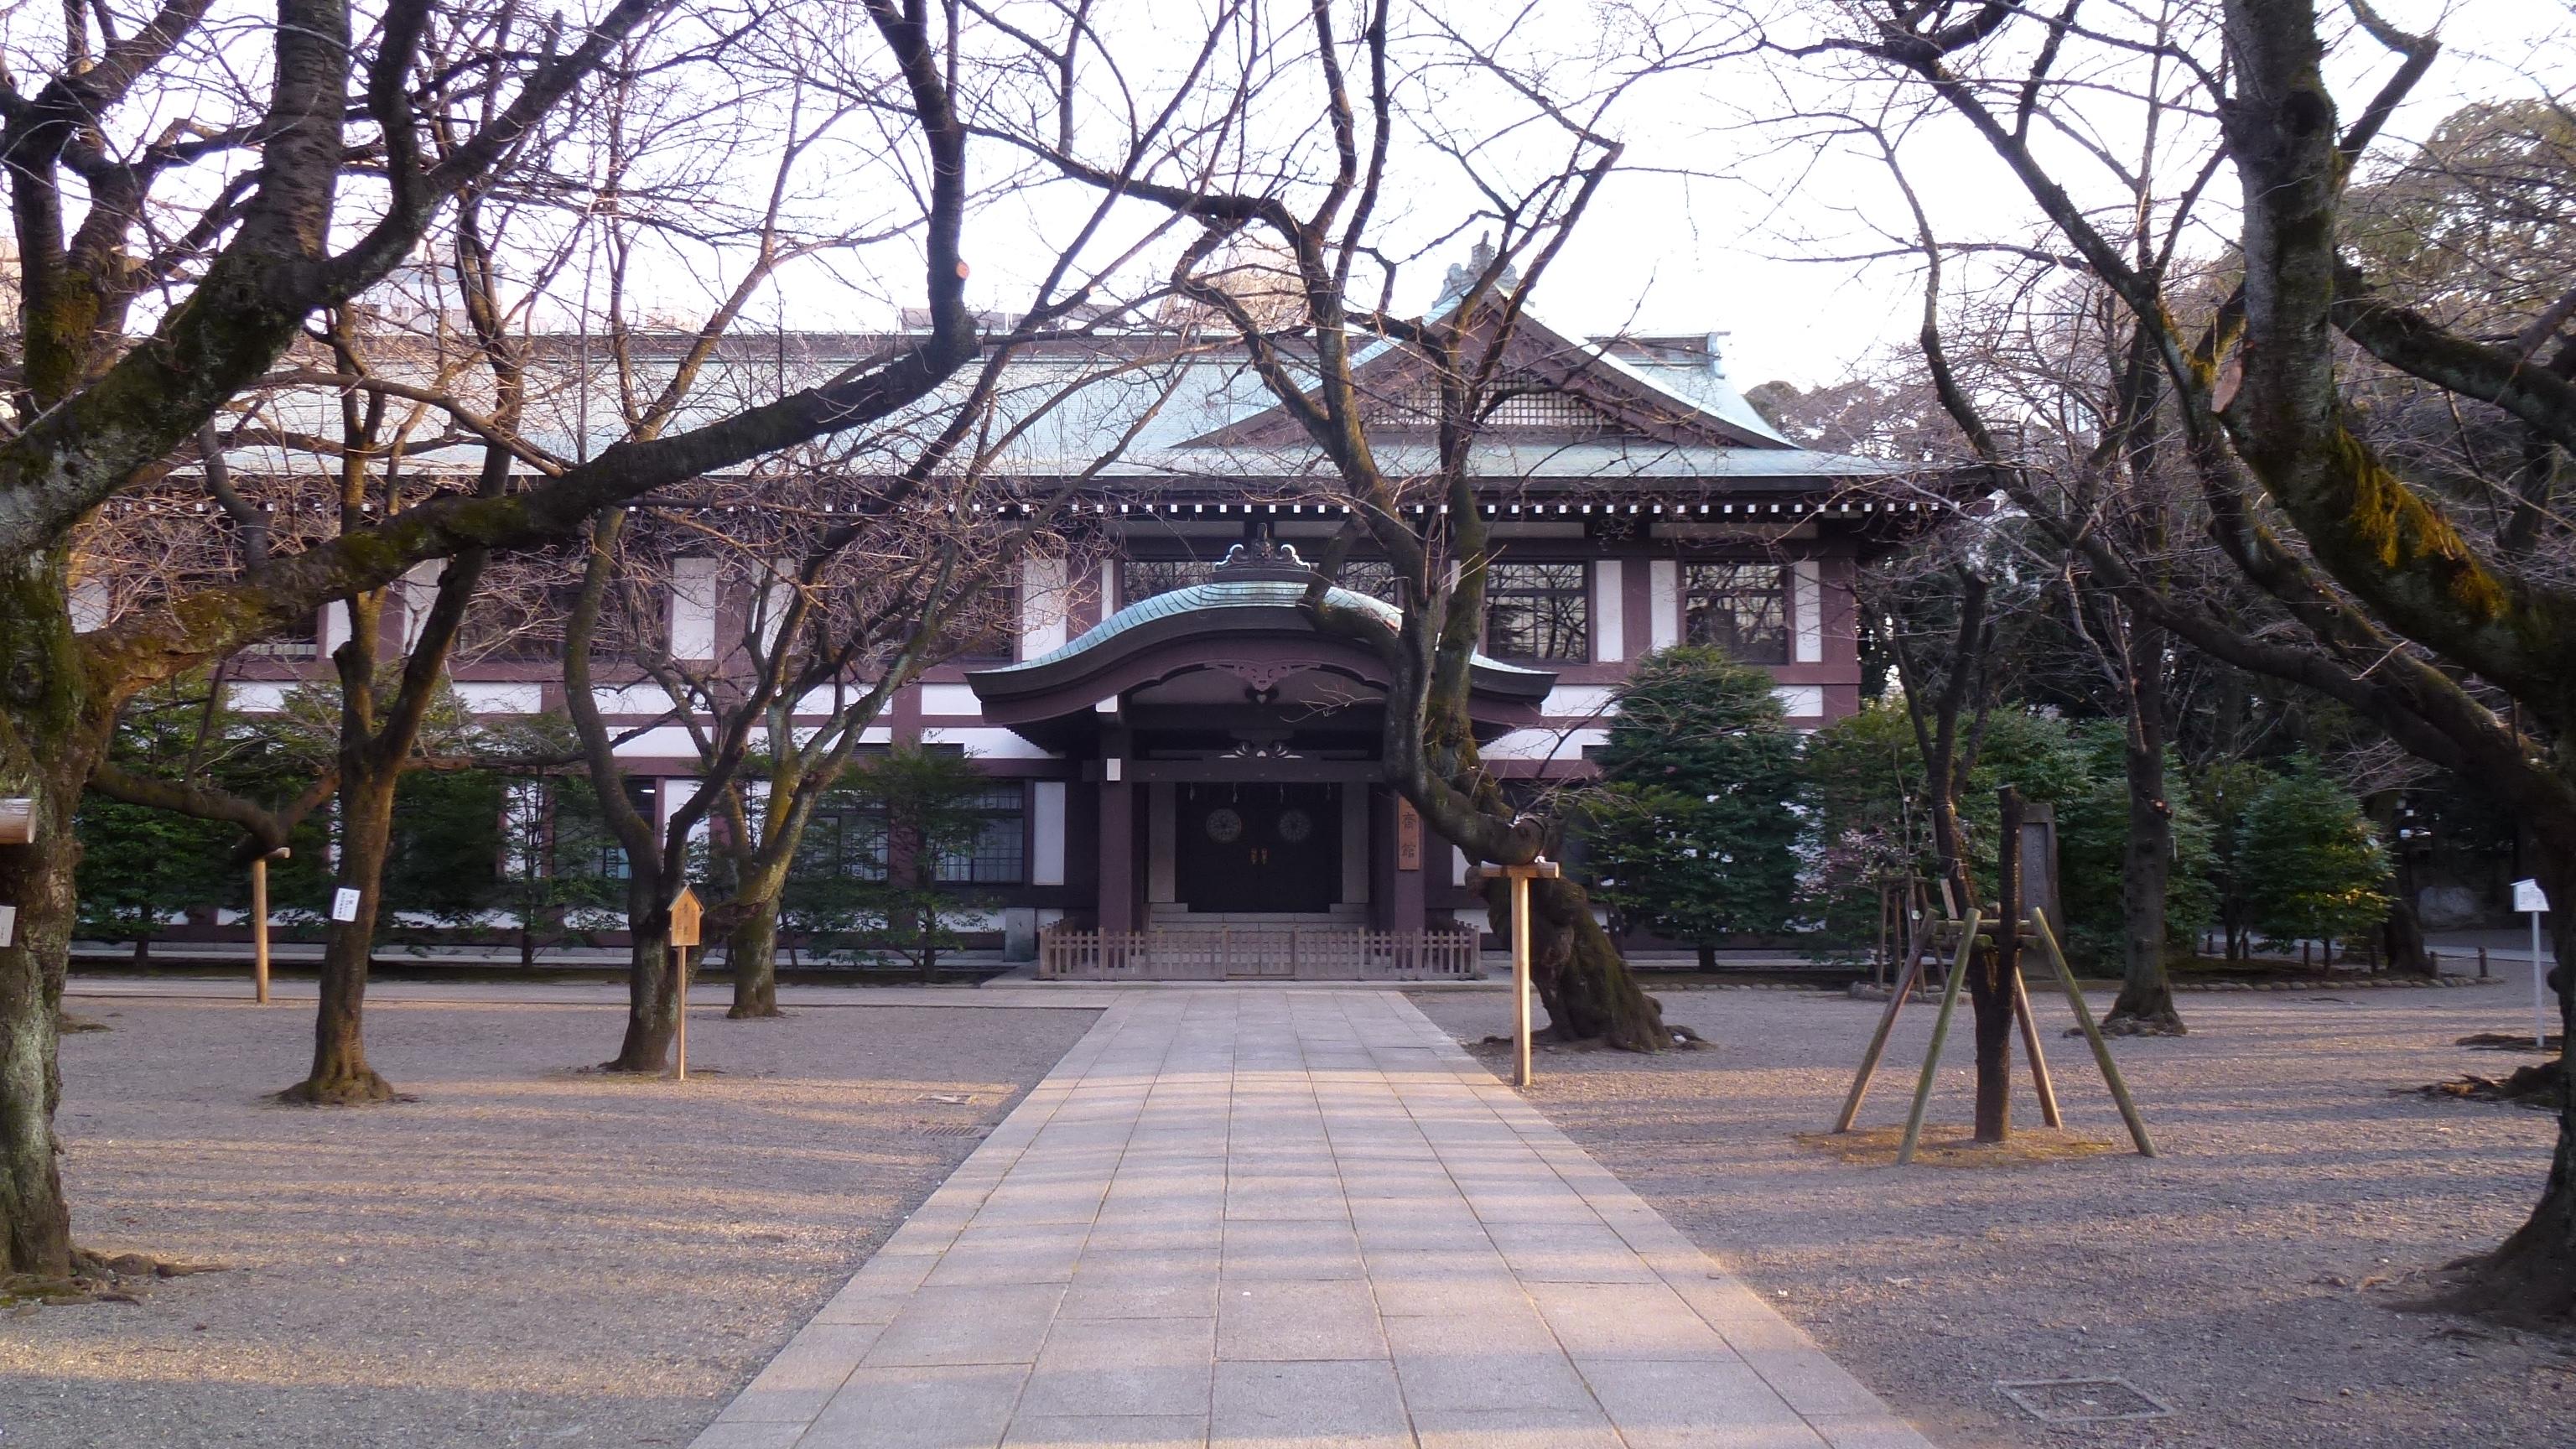 Jardin imp rial yasukuni jinja 3 mois au japon for Jardin imperial